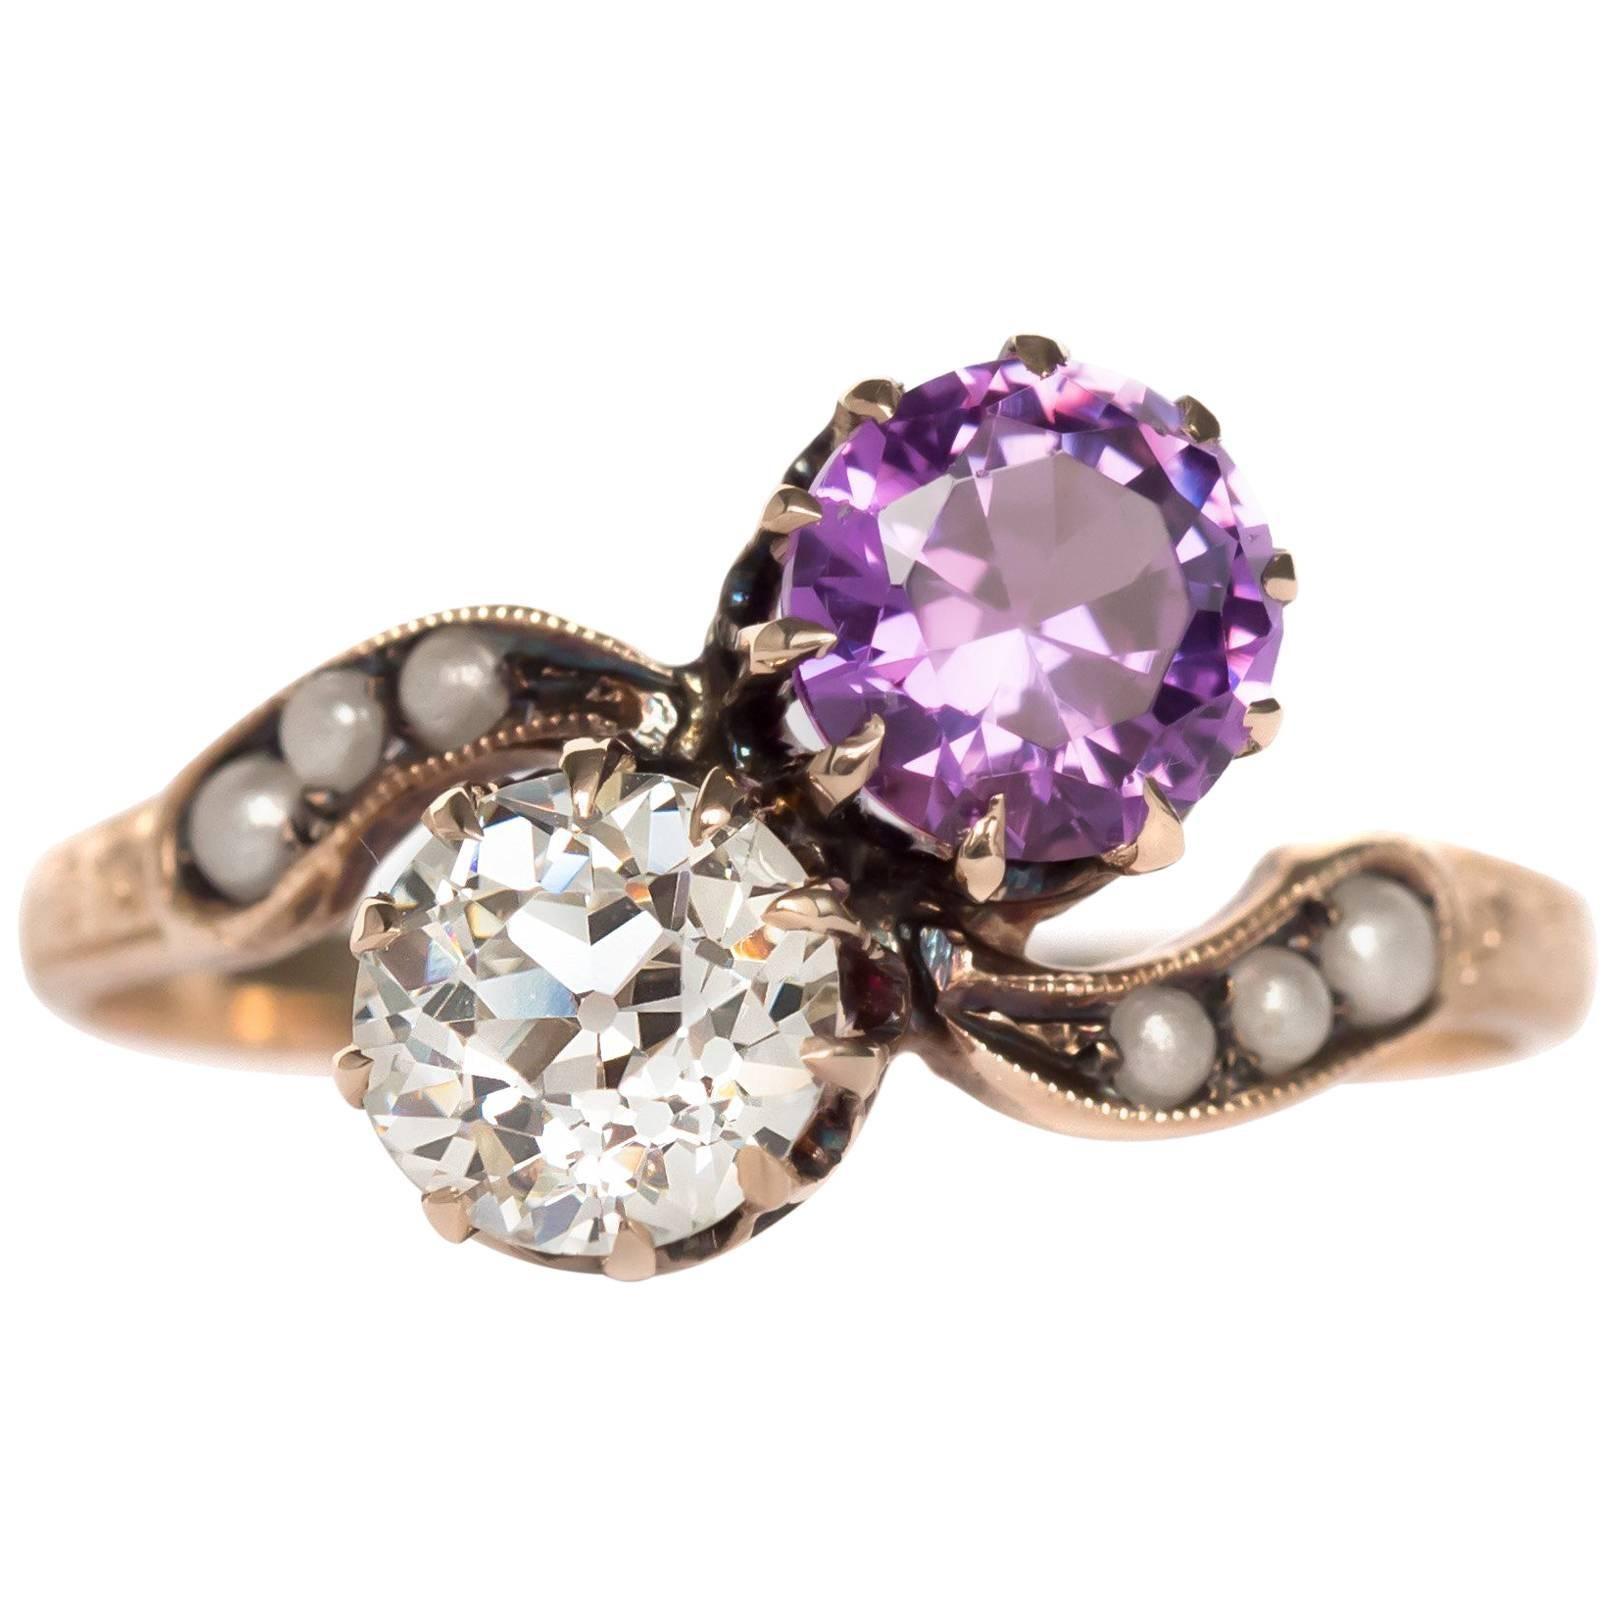 1890s Victorian Diamond and Amethyst 9 Karat Yellow Gold Engagement Ring